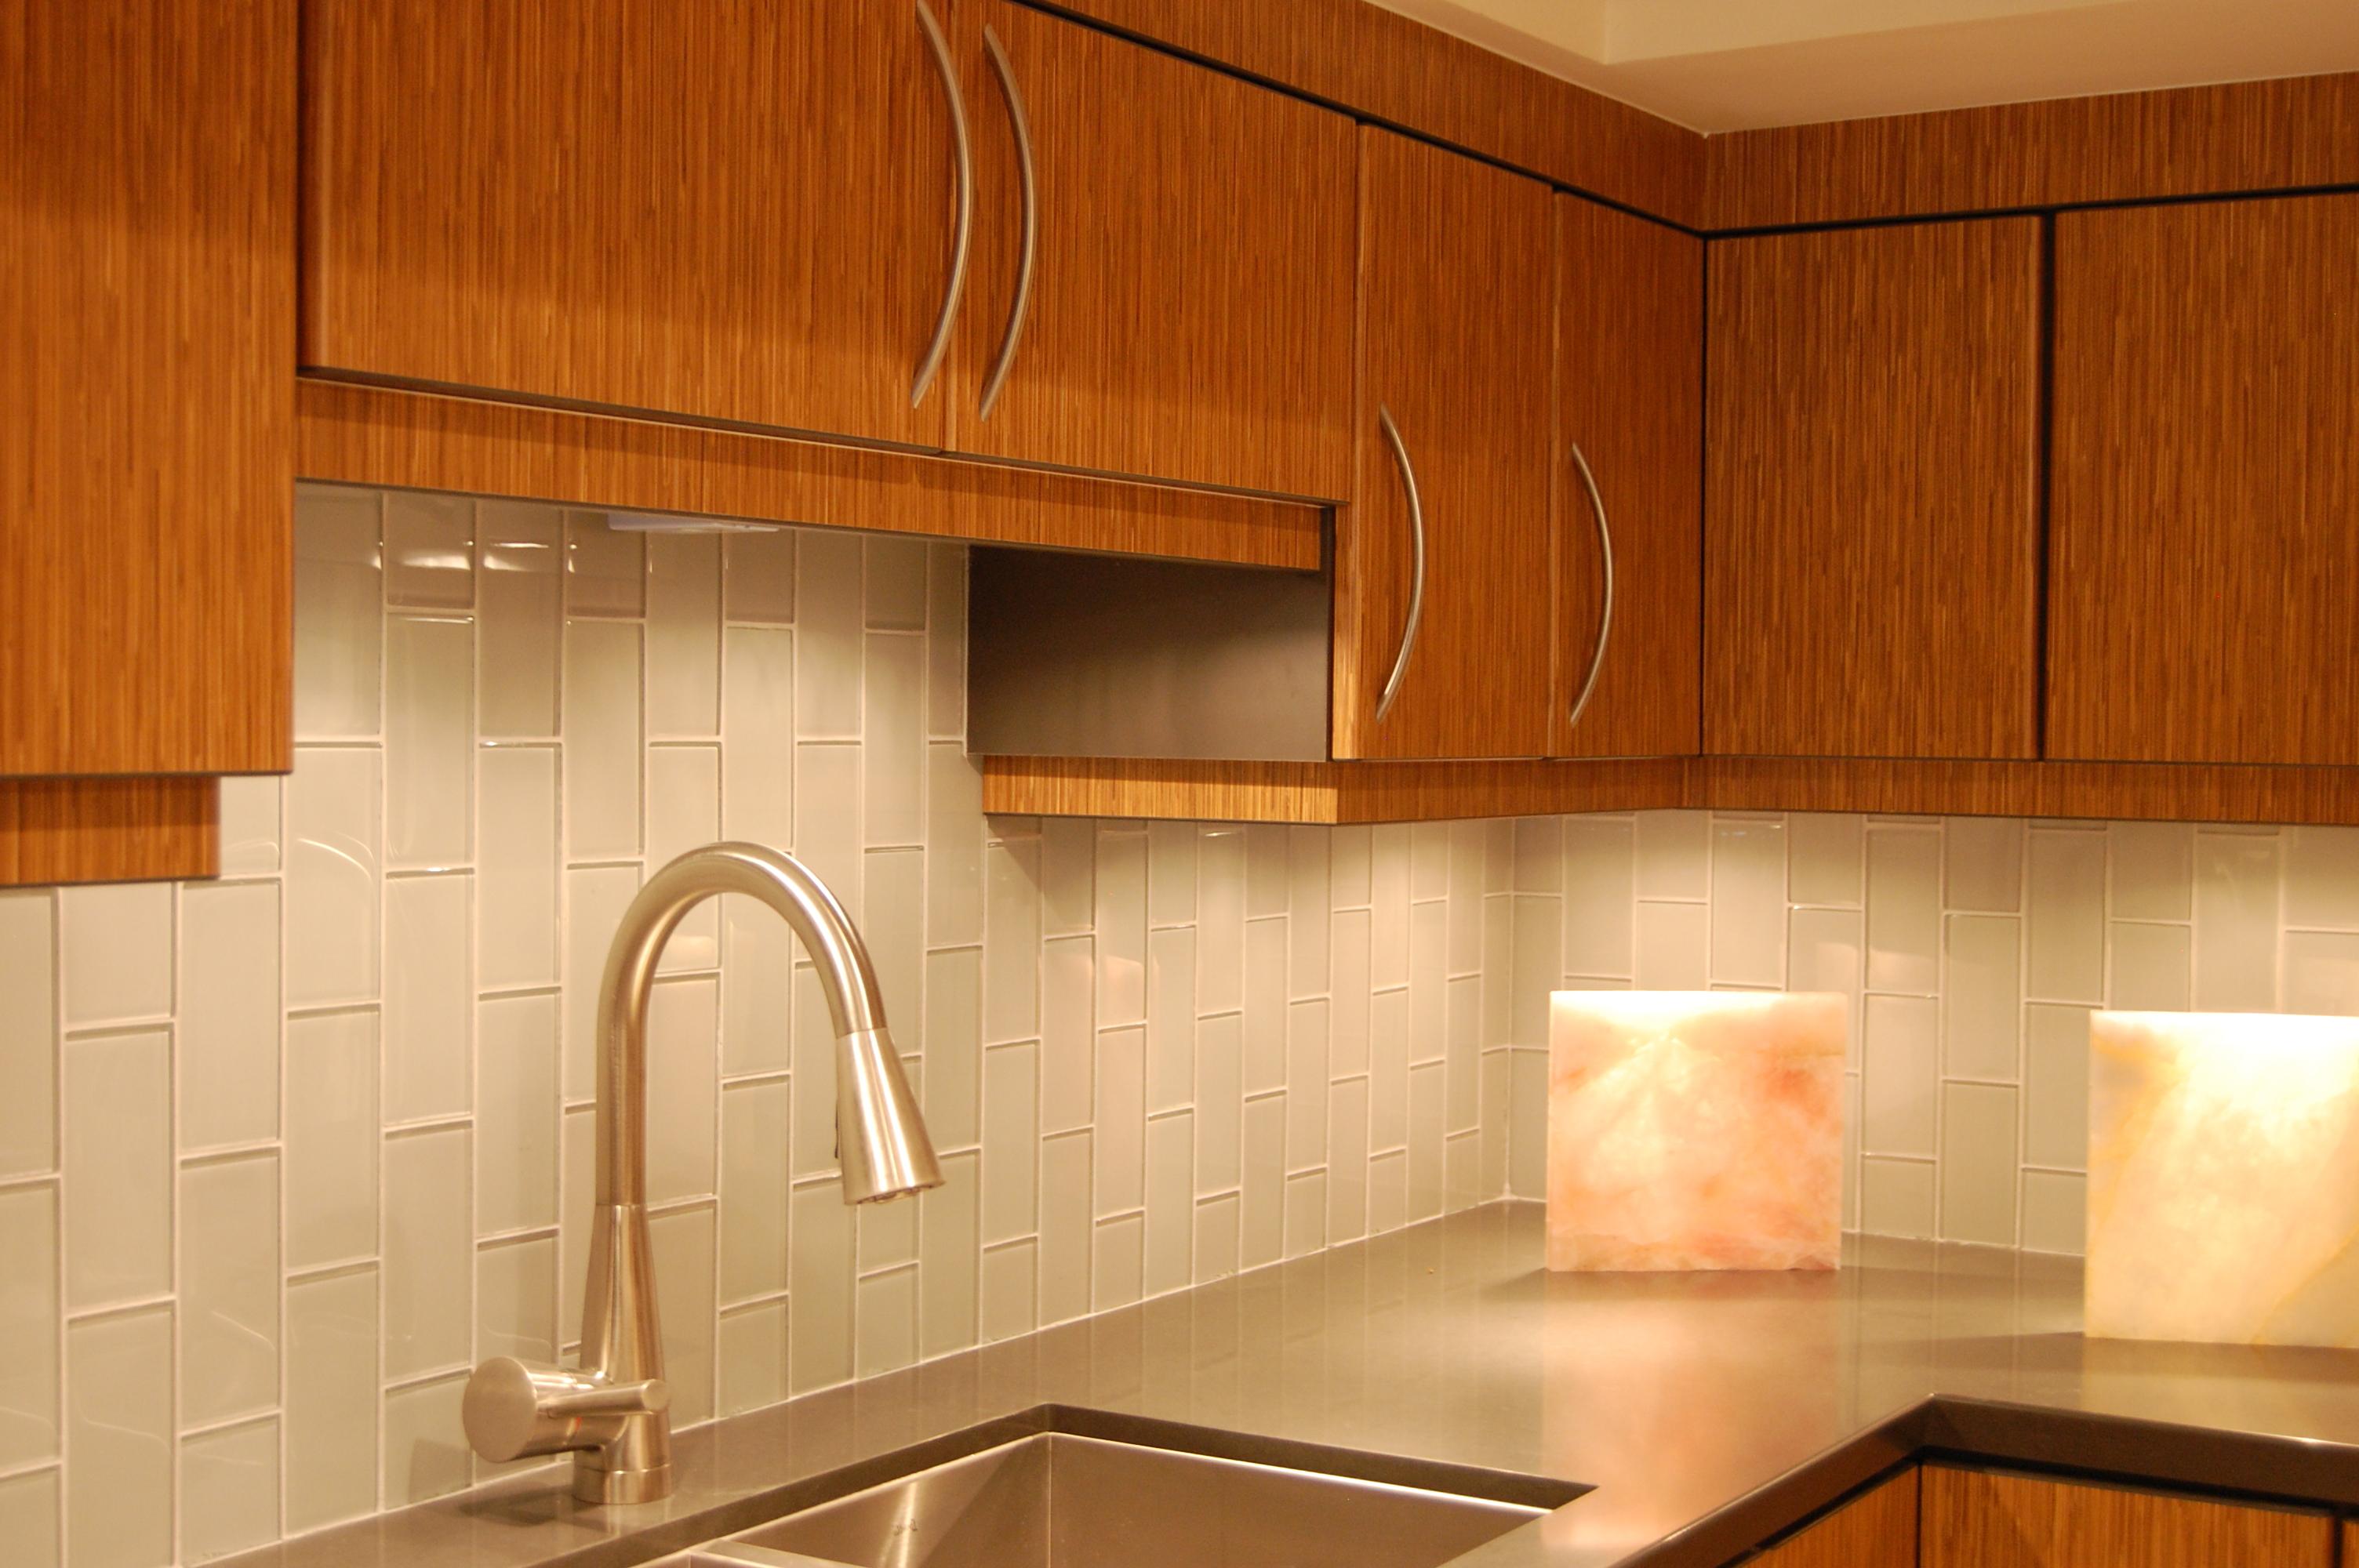 Kitchen Backsplash Pictures Of Subway Tile For Kitchen Decorations Ornament Ideas Backsplashes Wall Ceramic Kitchens How To Patterns Travertine Mosaic Wholesale Flooring Subway Tile (Image 23 of 38)